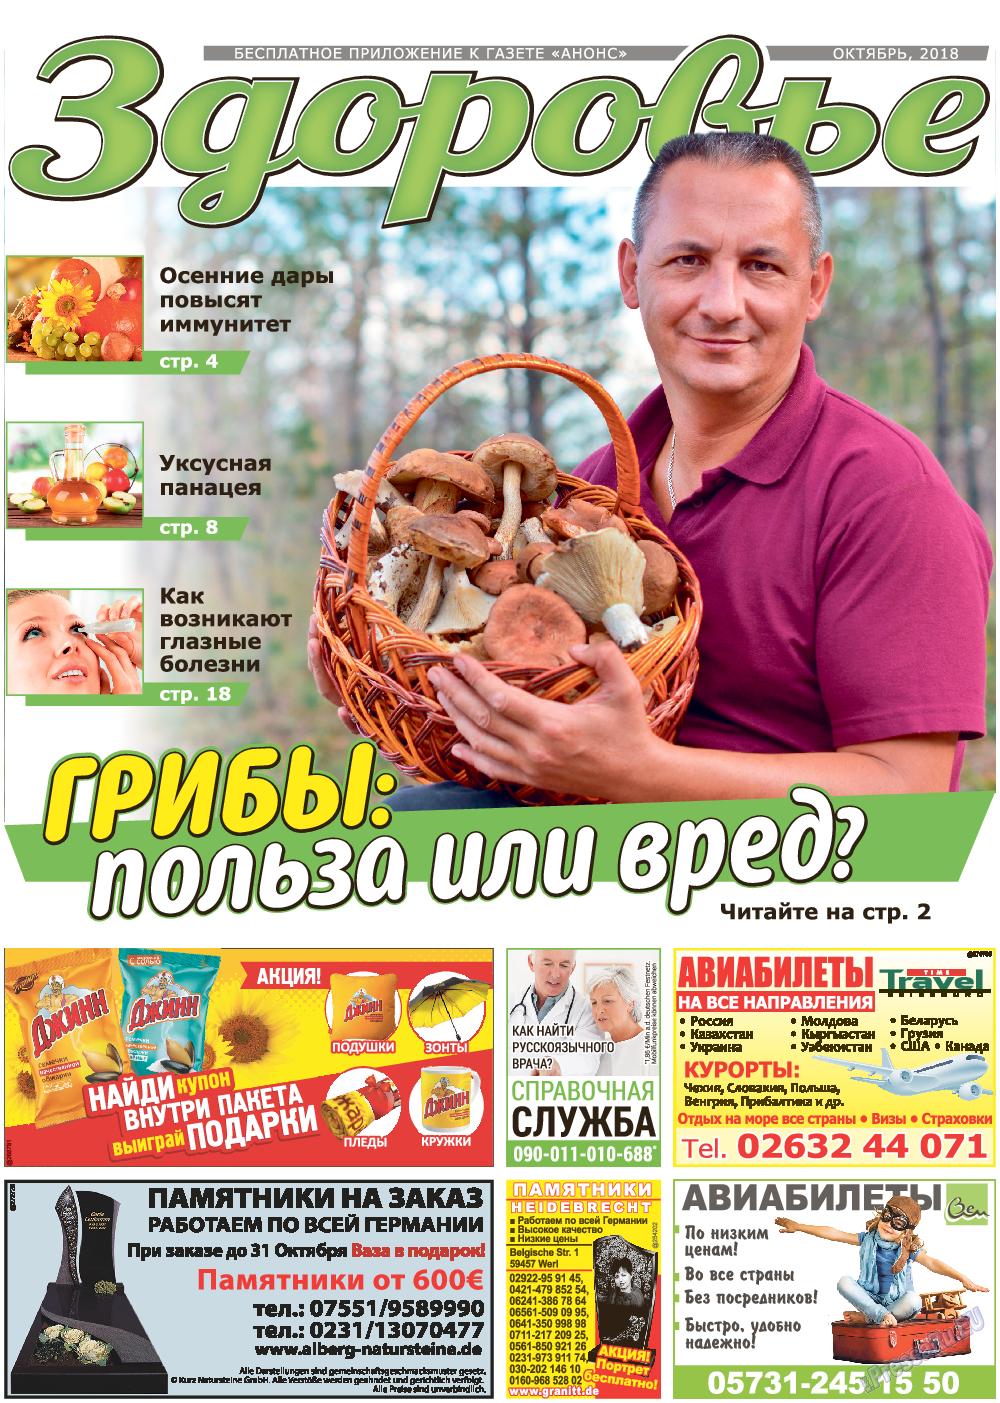 Здоровье (газета). 2018 год, номер 10, стр. 1